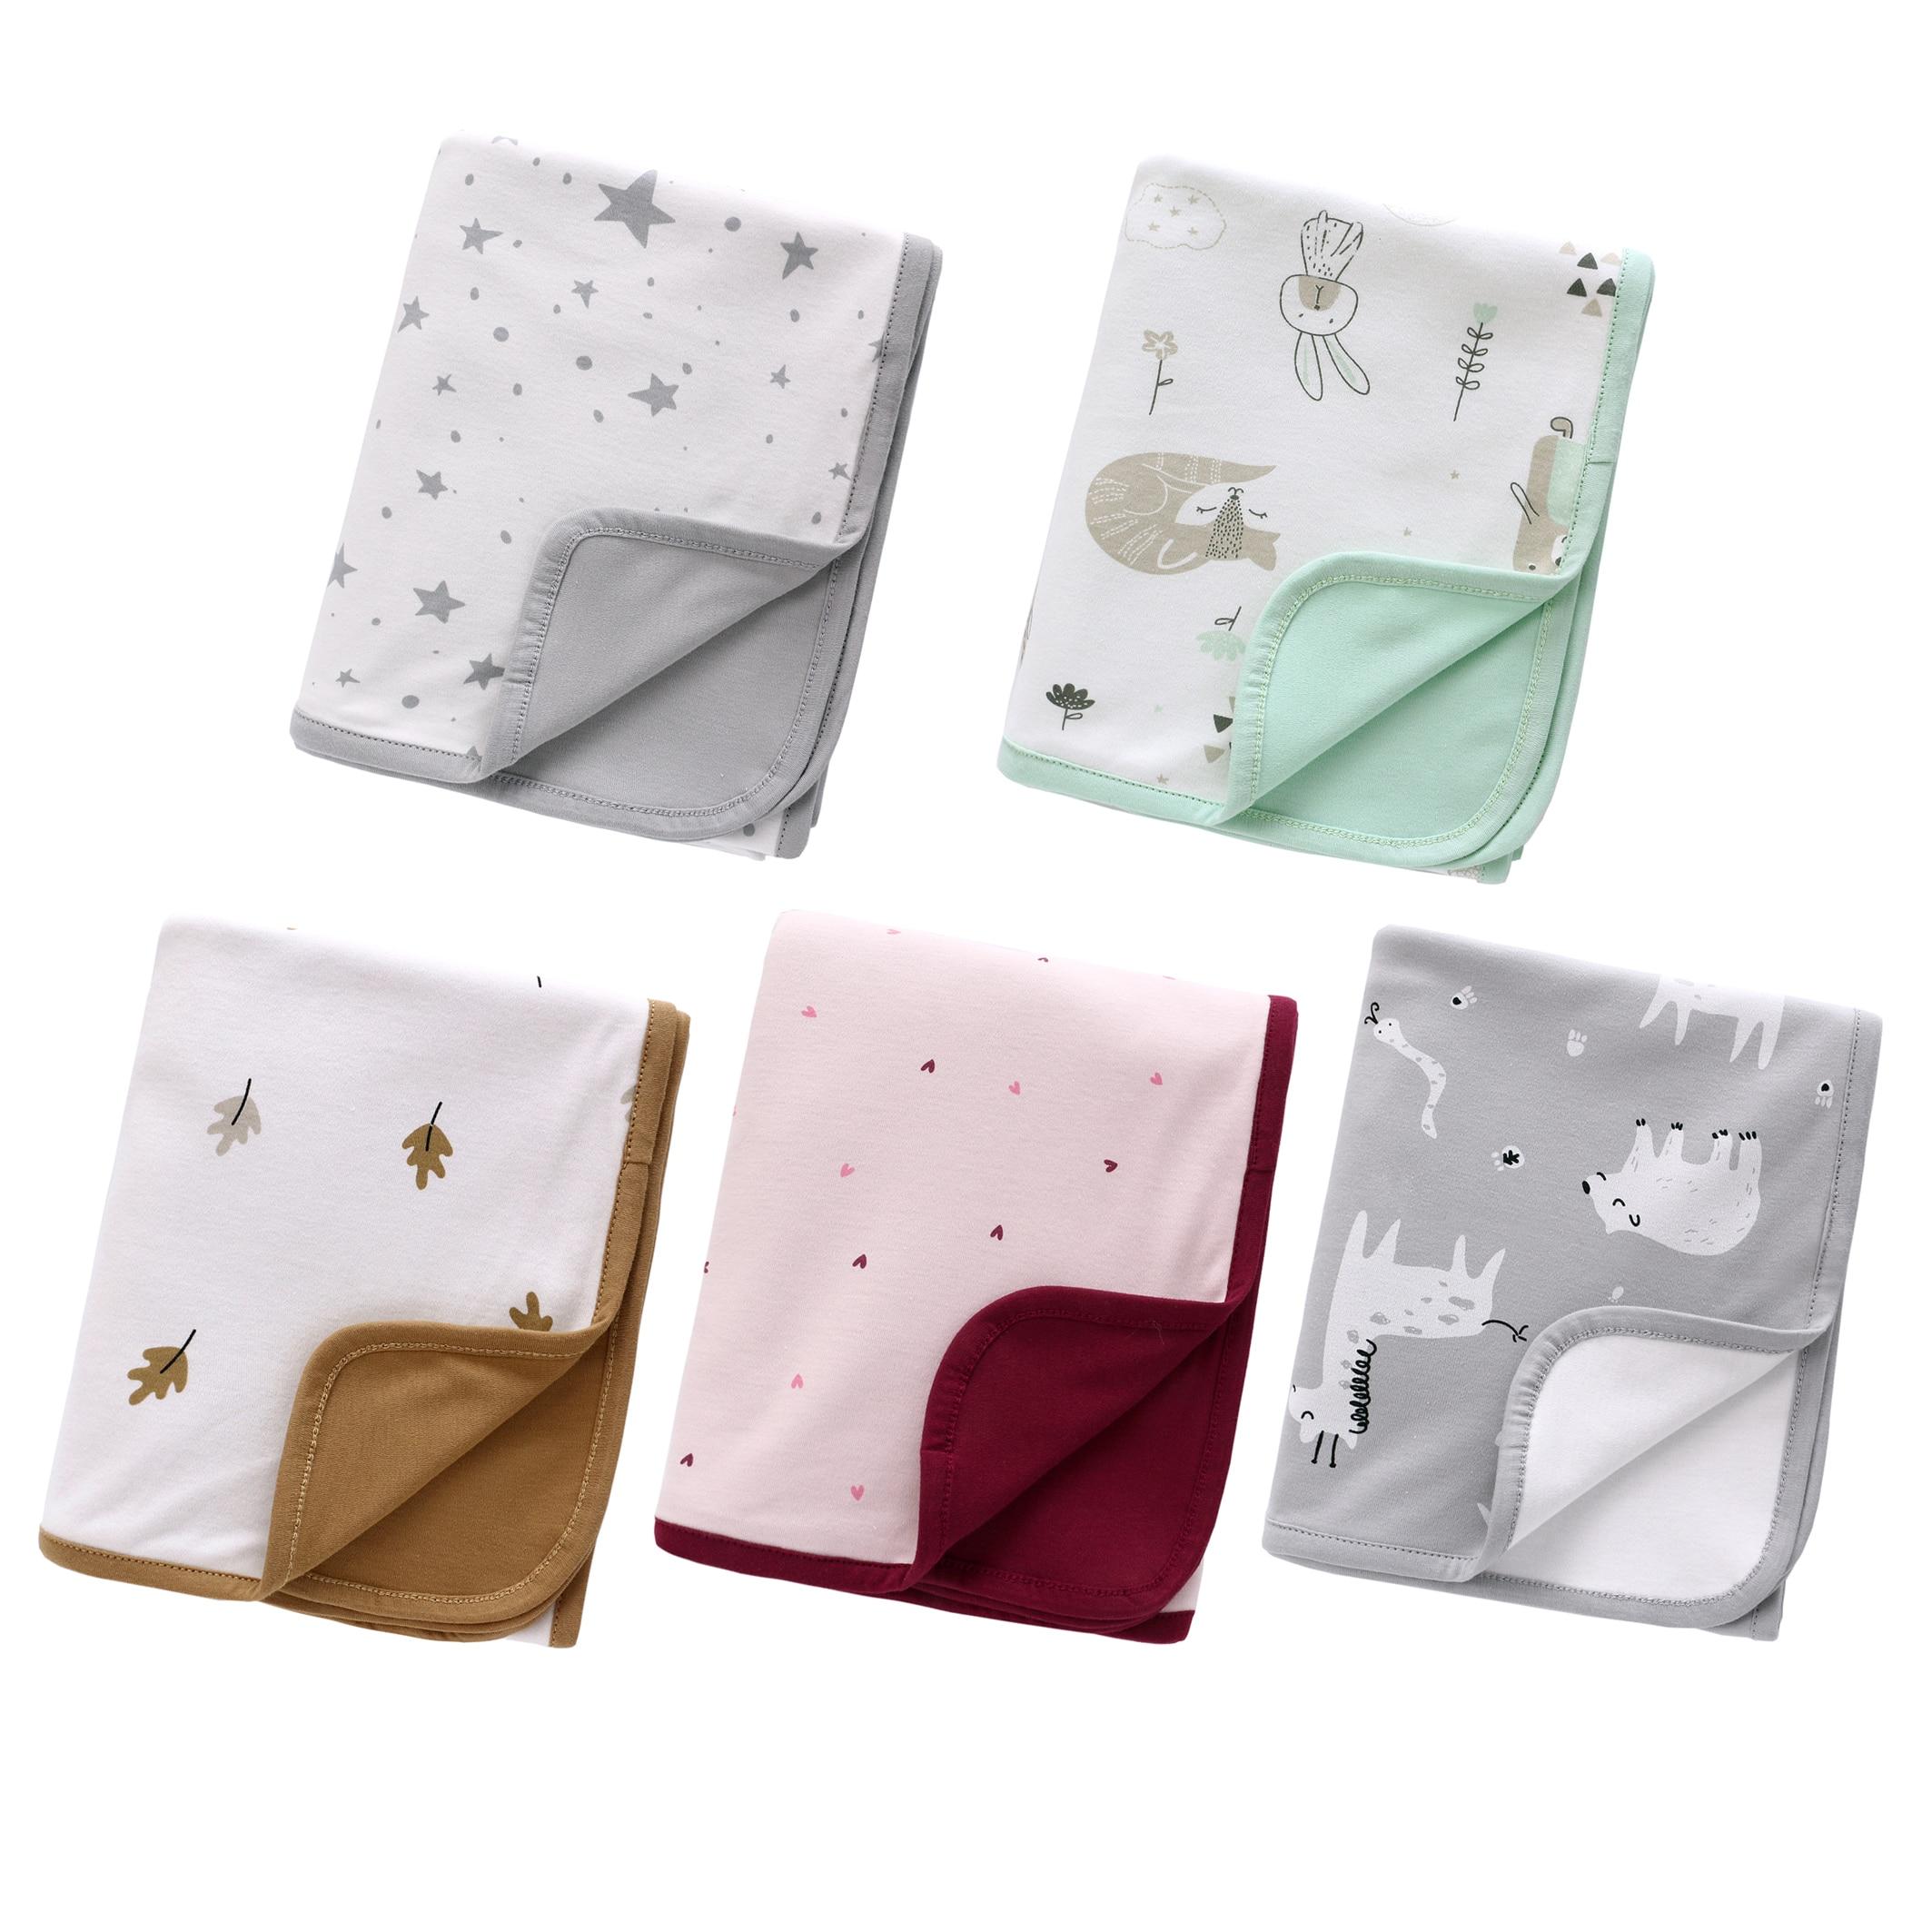 110*140cm Pure Cotton Baby Blankets Newborns Swaddle Blanket Infant Bath Blanket Toddler Swaddling Wrap Quilt for Bedding deken